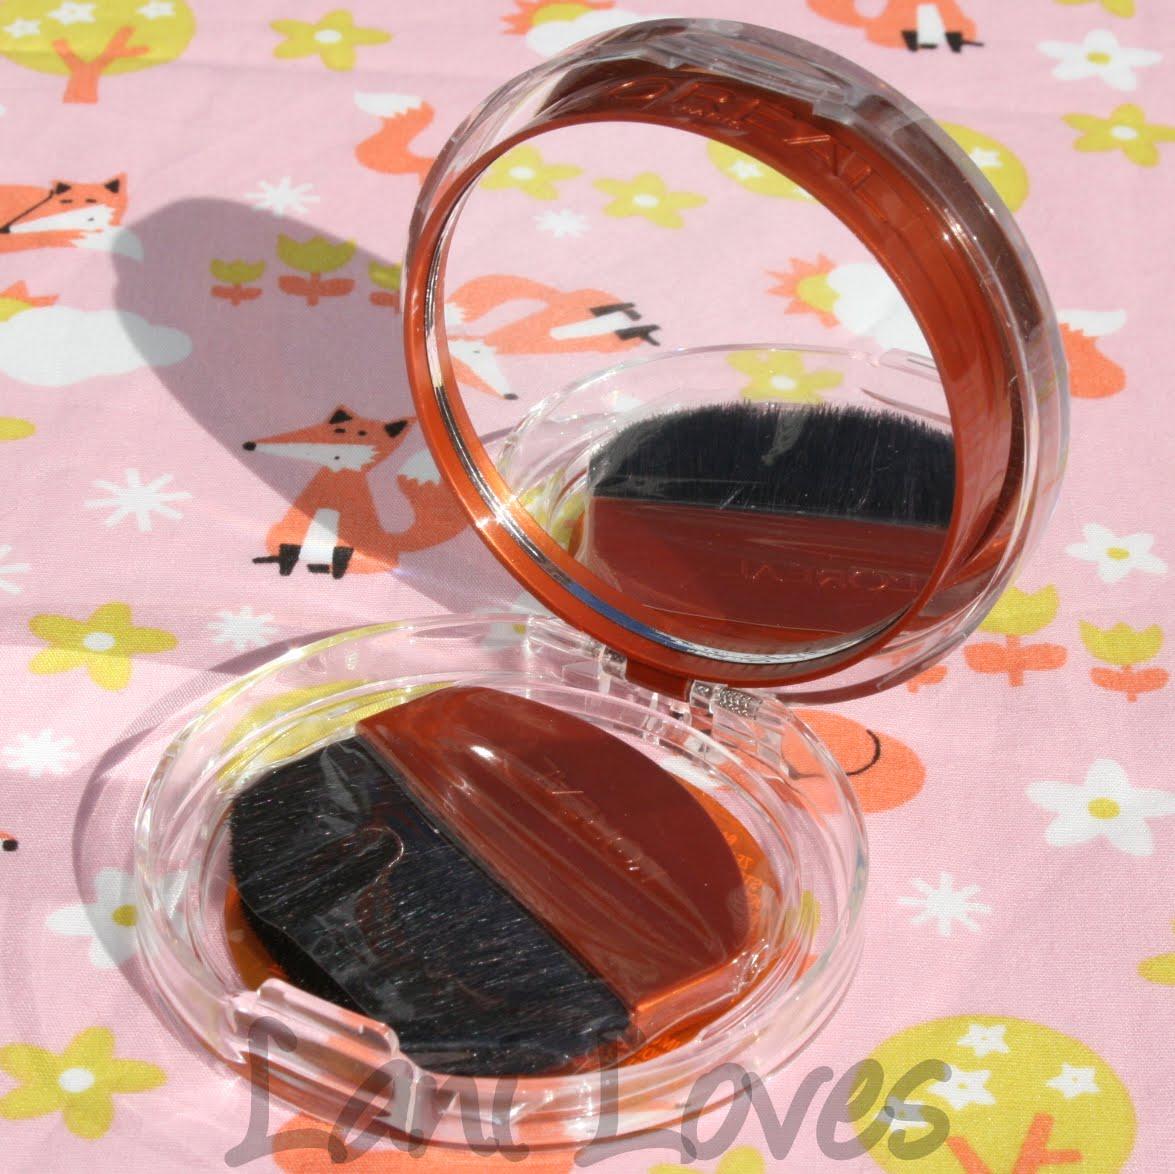 L'Oreal Glam Bronze Blonde Harmony